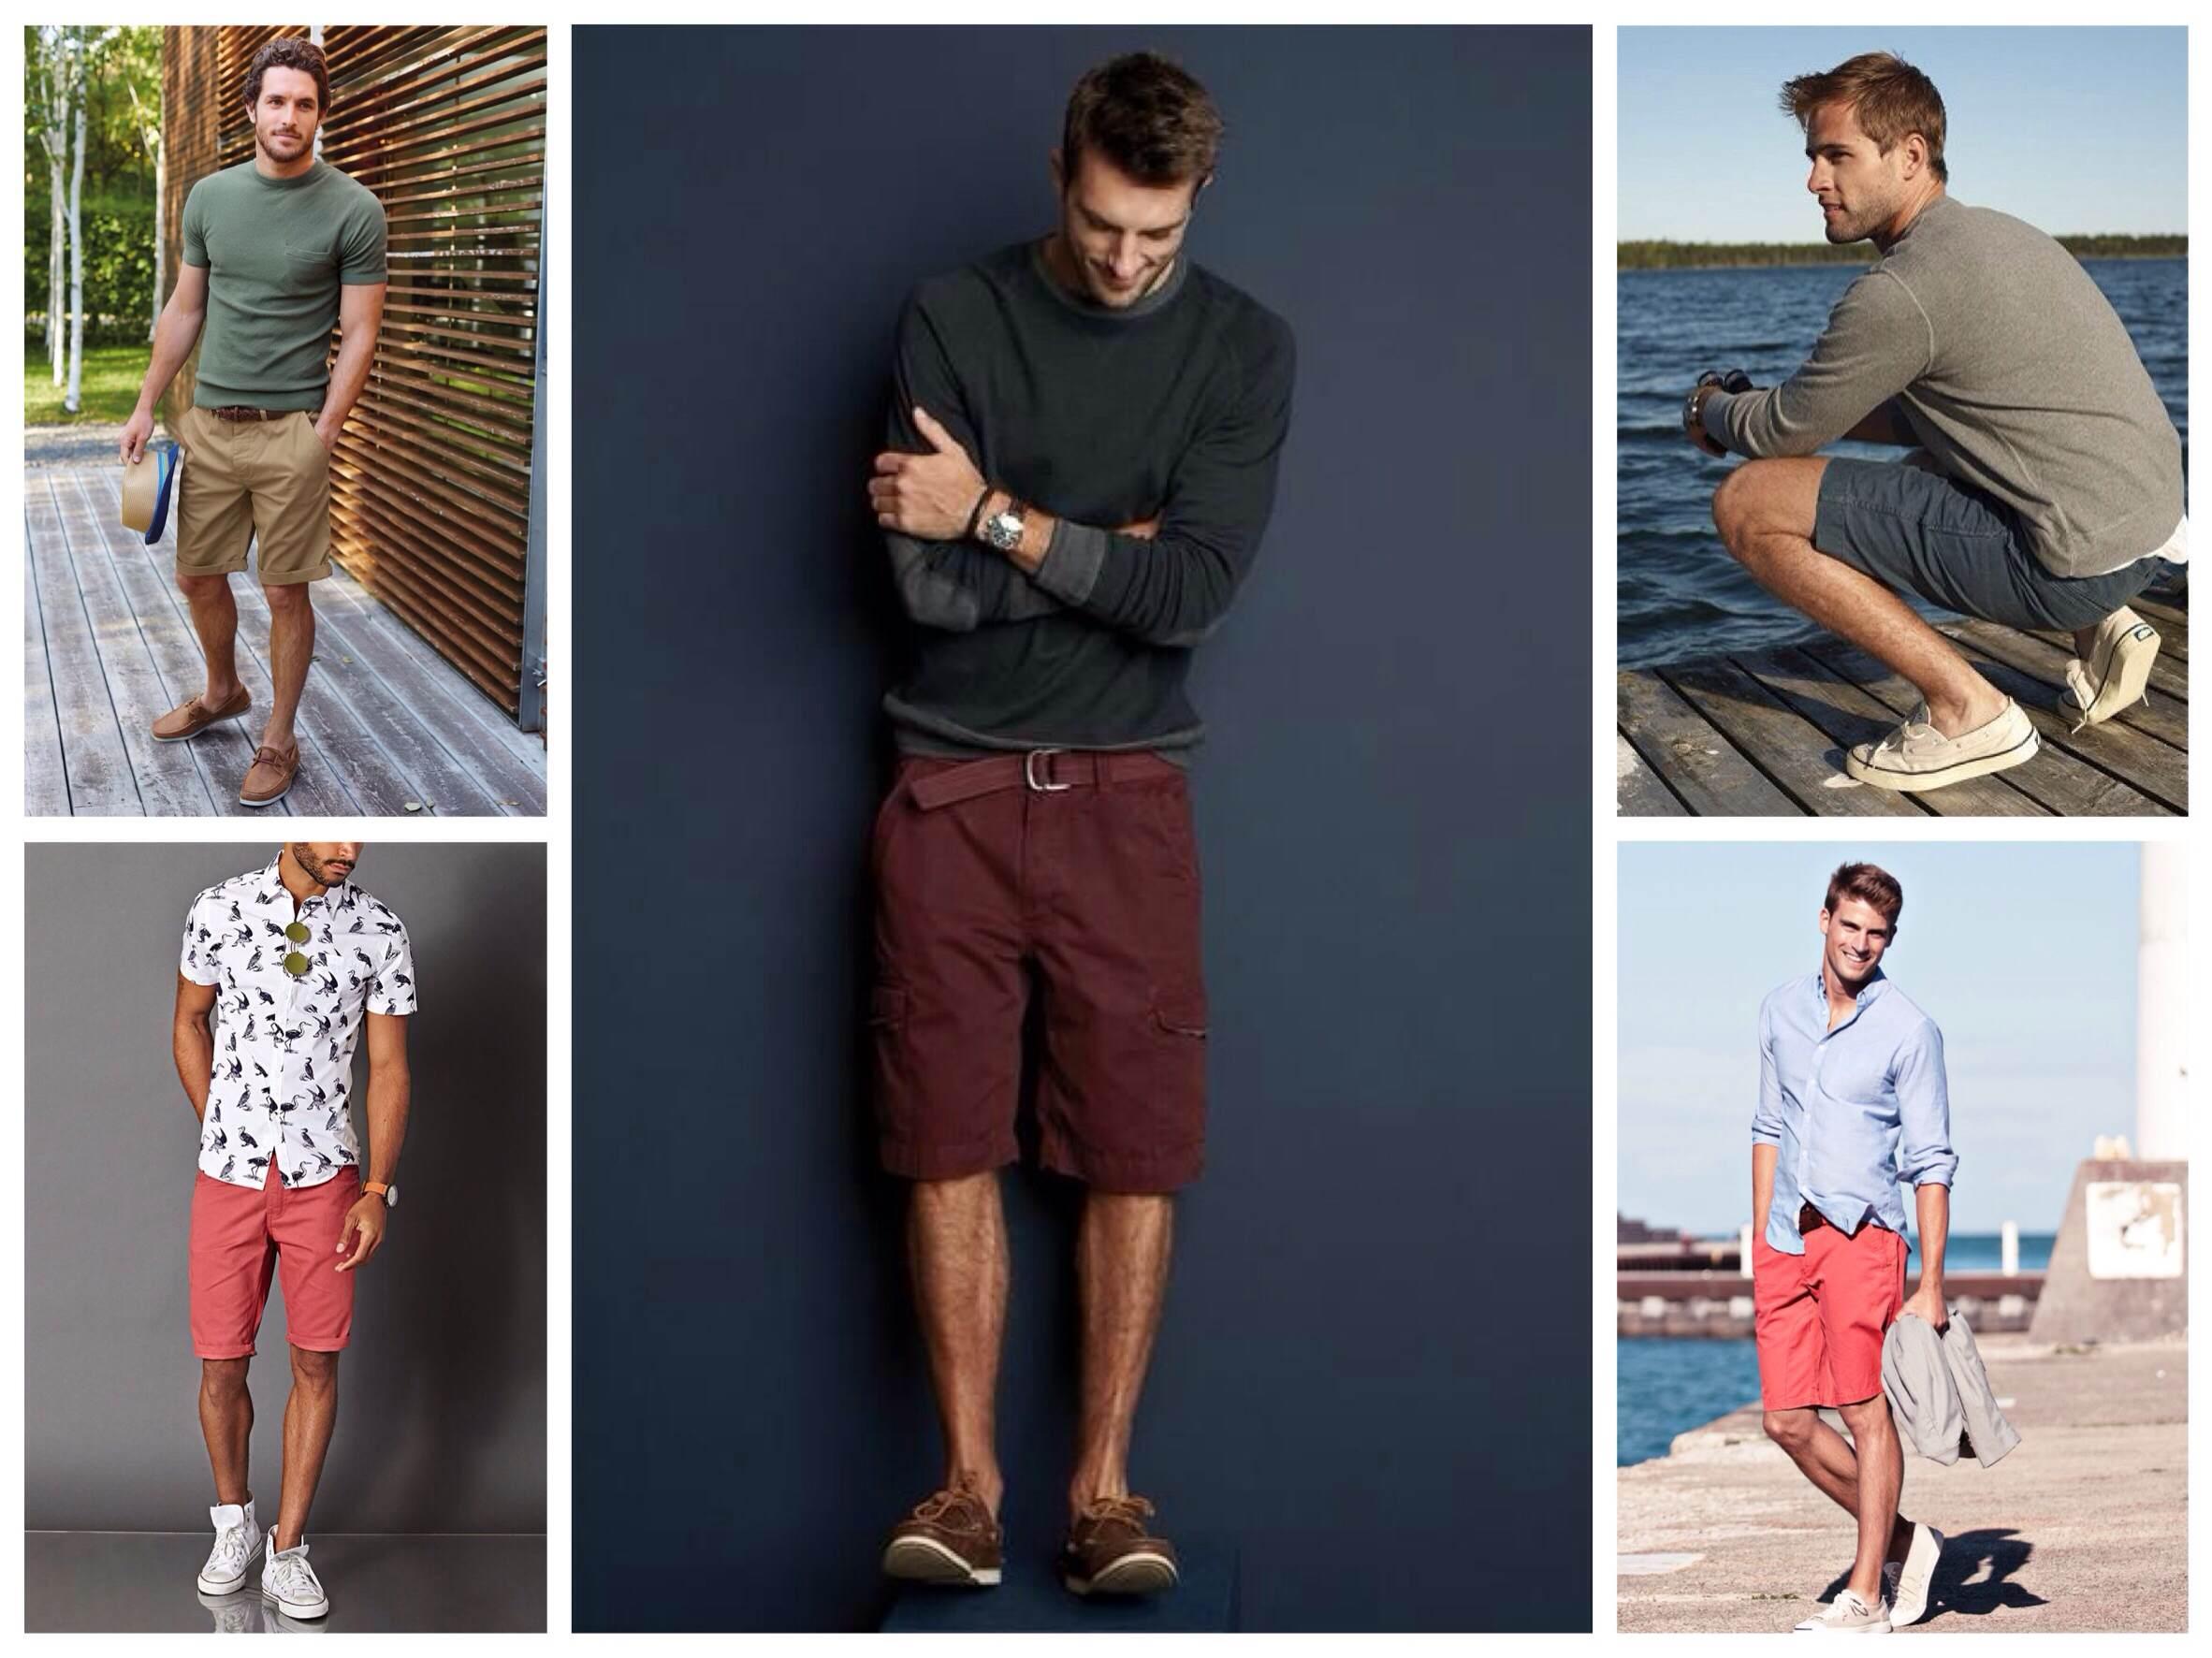 47e5936da5f0 Разнообразие мужских образов с шортами